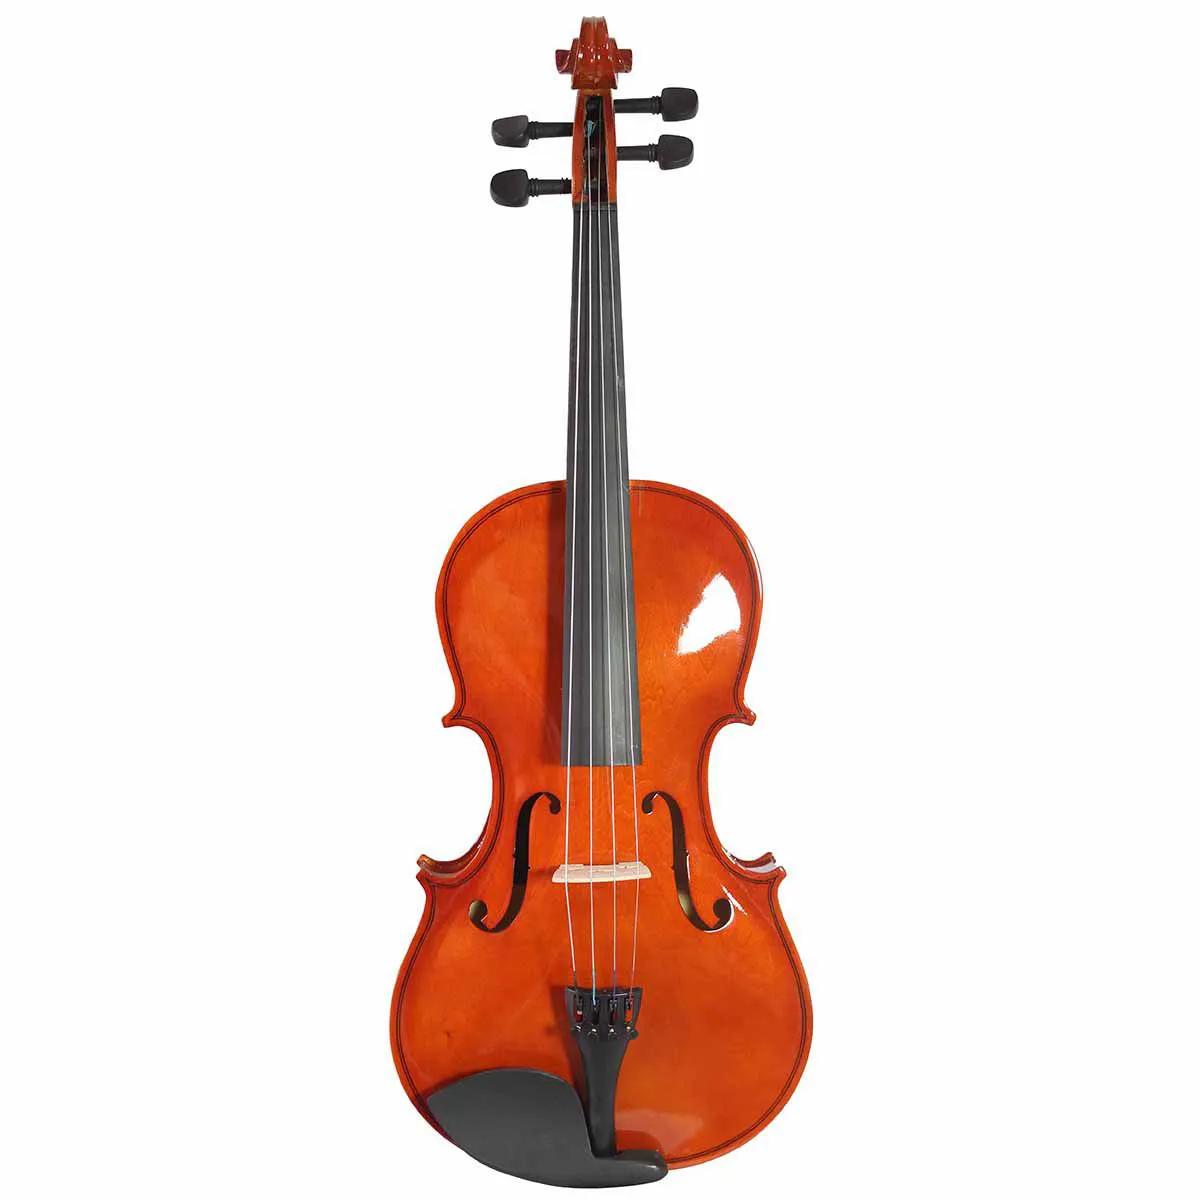 Viola de Arco Jahnke JVO001 4/4 Natural com Case